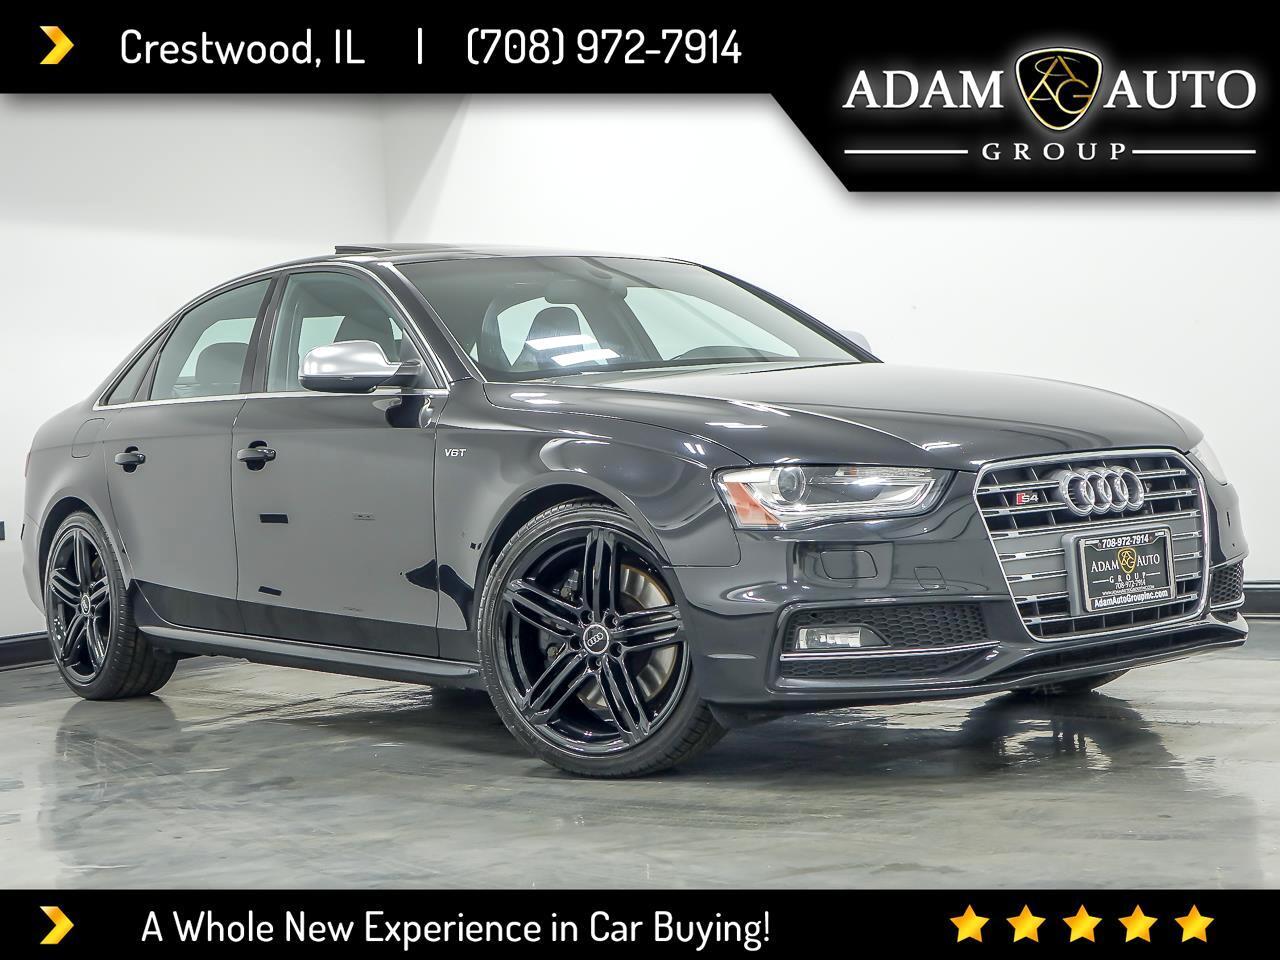 Audi S4 Under 500 Dollars Down